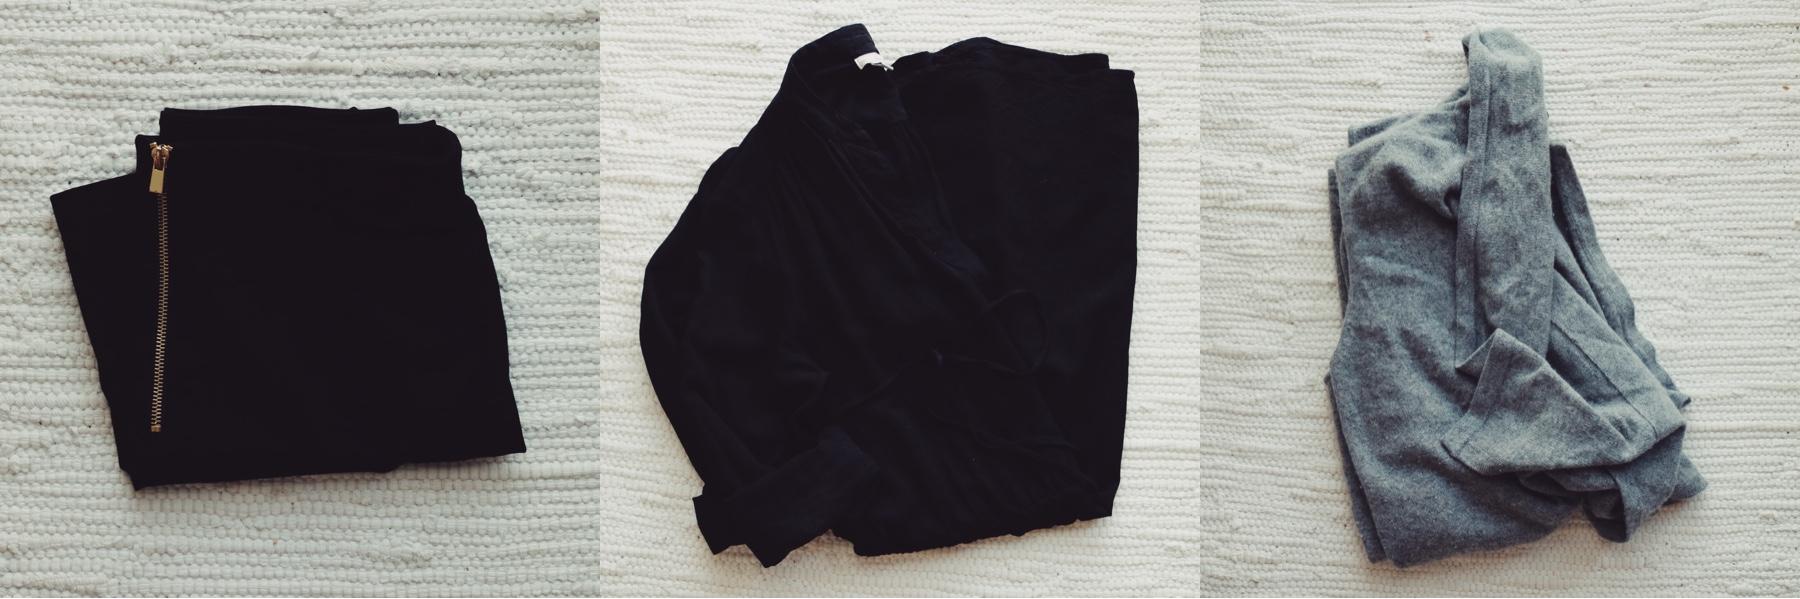 10-x-10-wardrobe-challenge-fall-slow-fashion